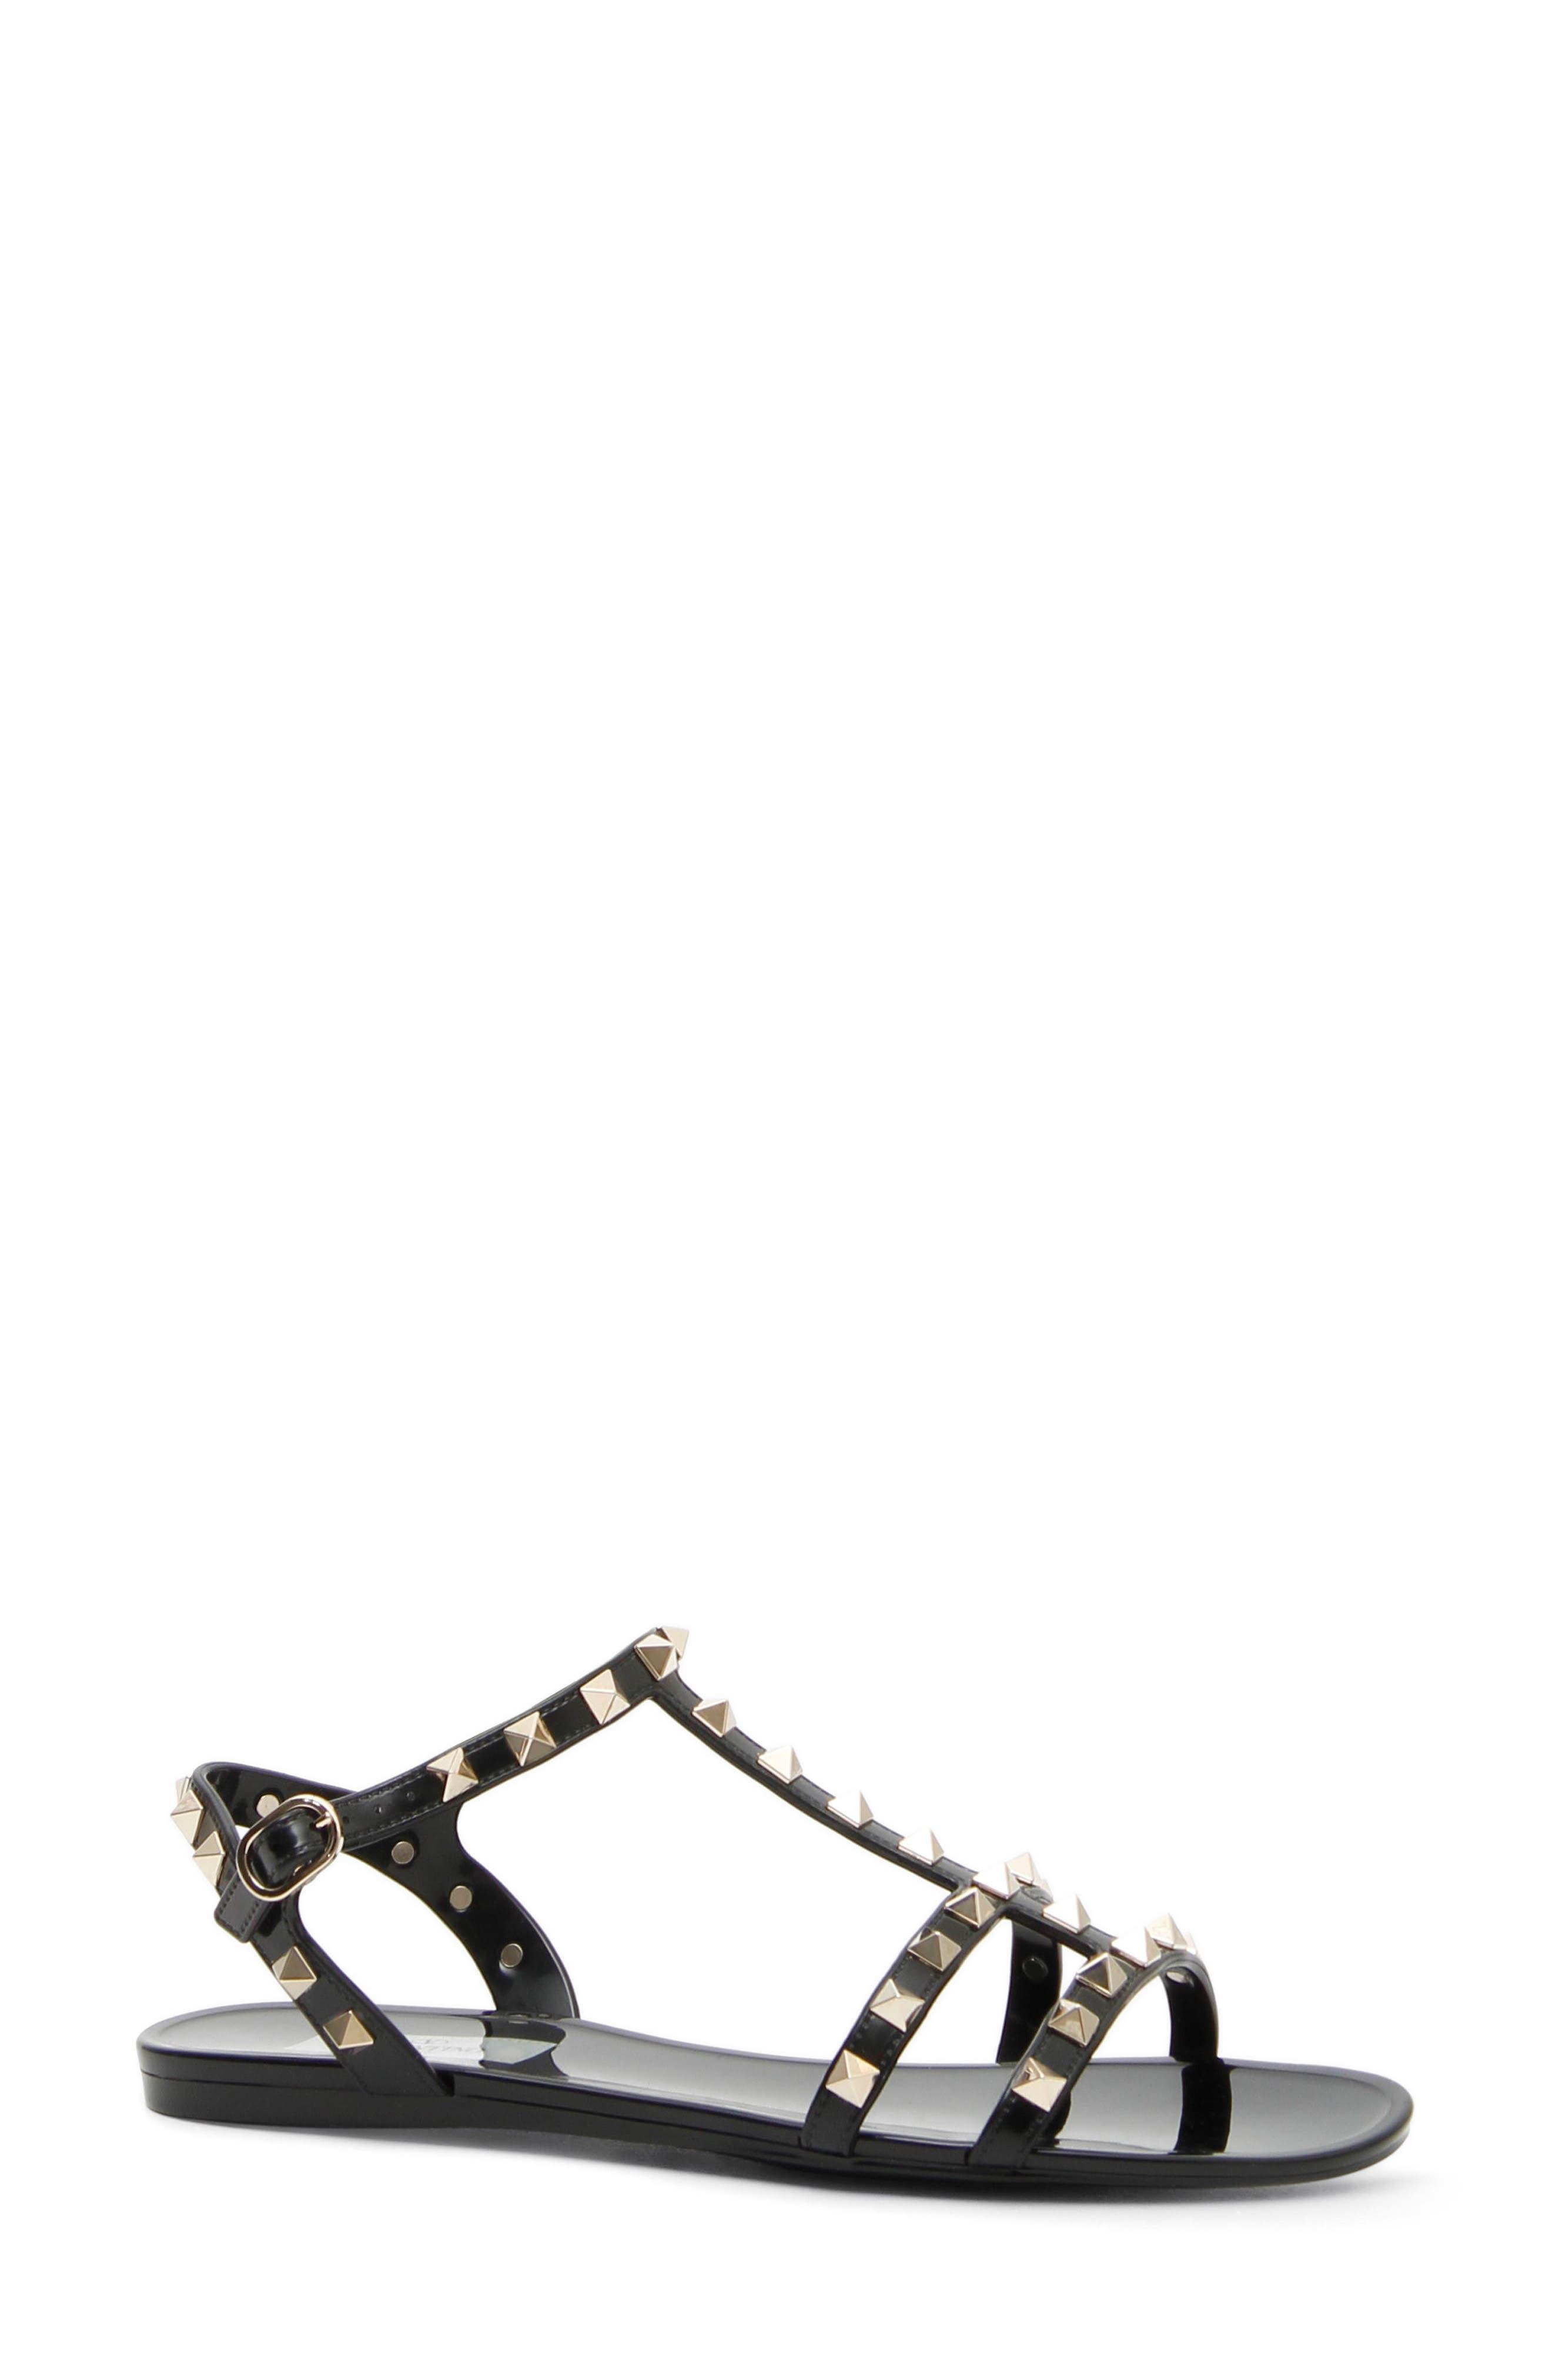 Main Image - VALENTINO GARAVANI Rockstud T-Strap Sandal (Women)